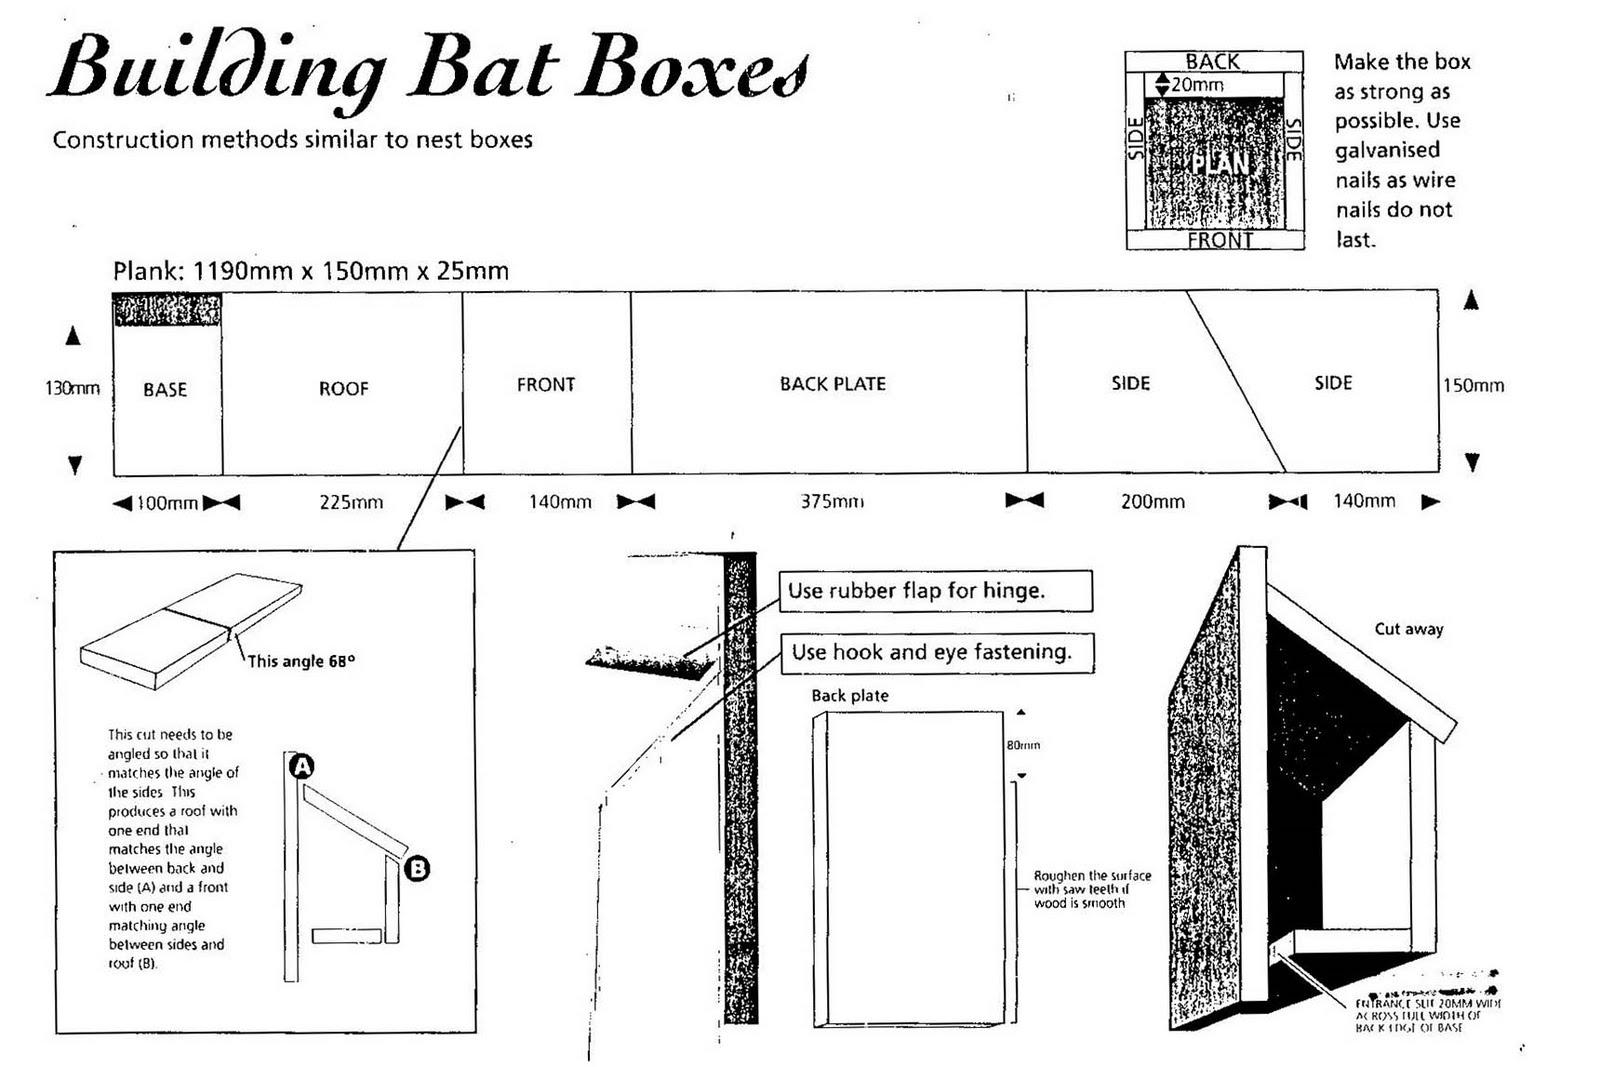 Wirral Wildlife Blog How To Make A Bat Box